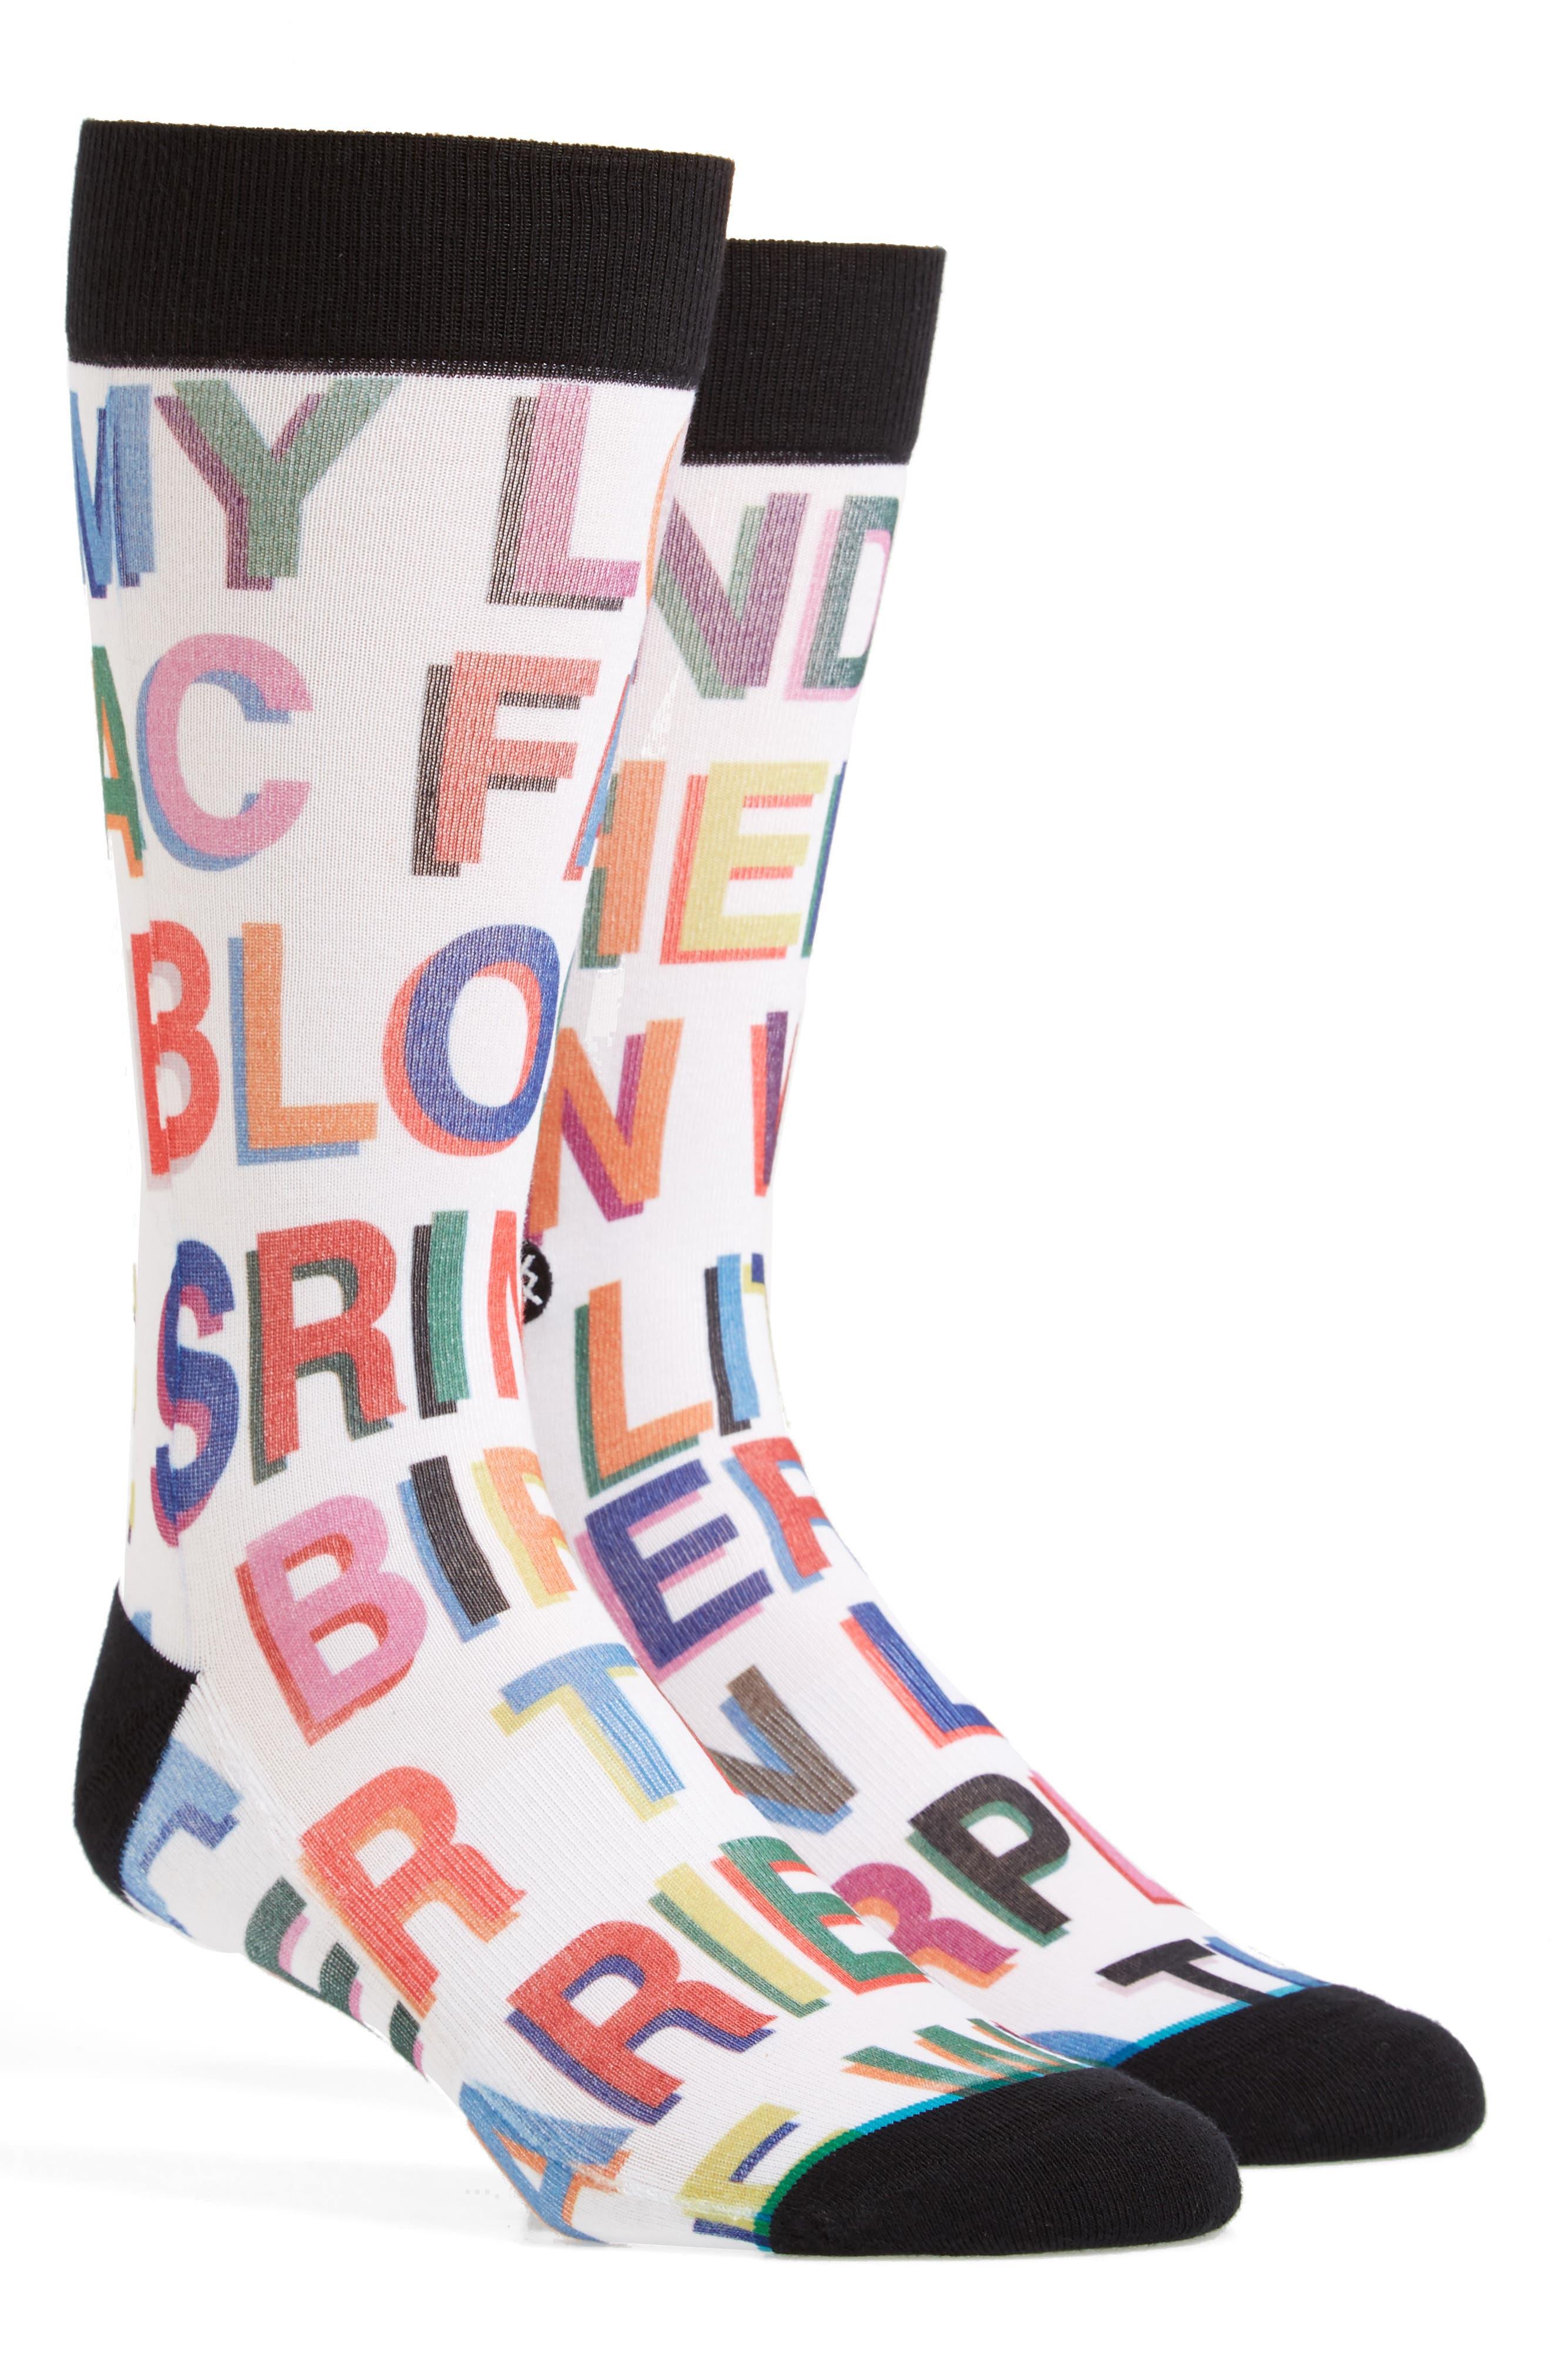 Main Image - Stance Love Letters Crew Socks